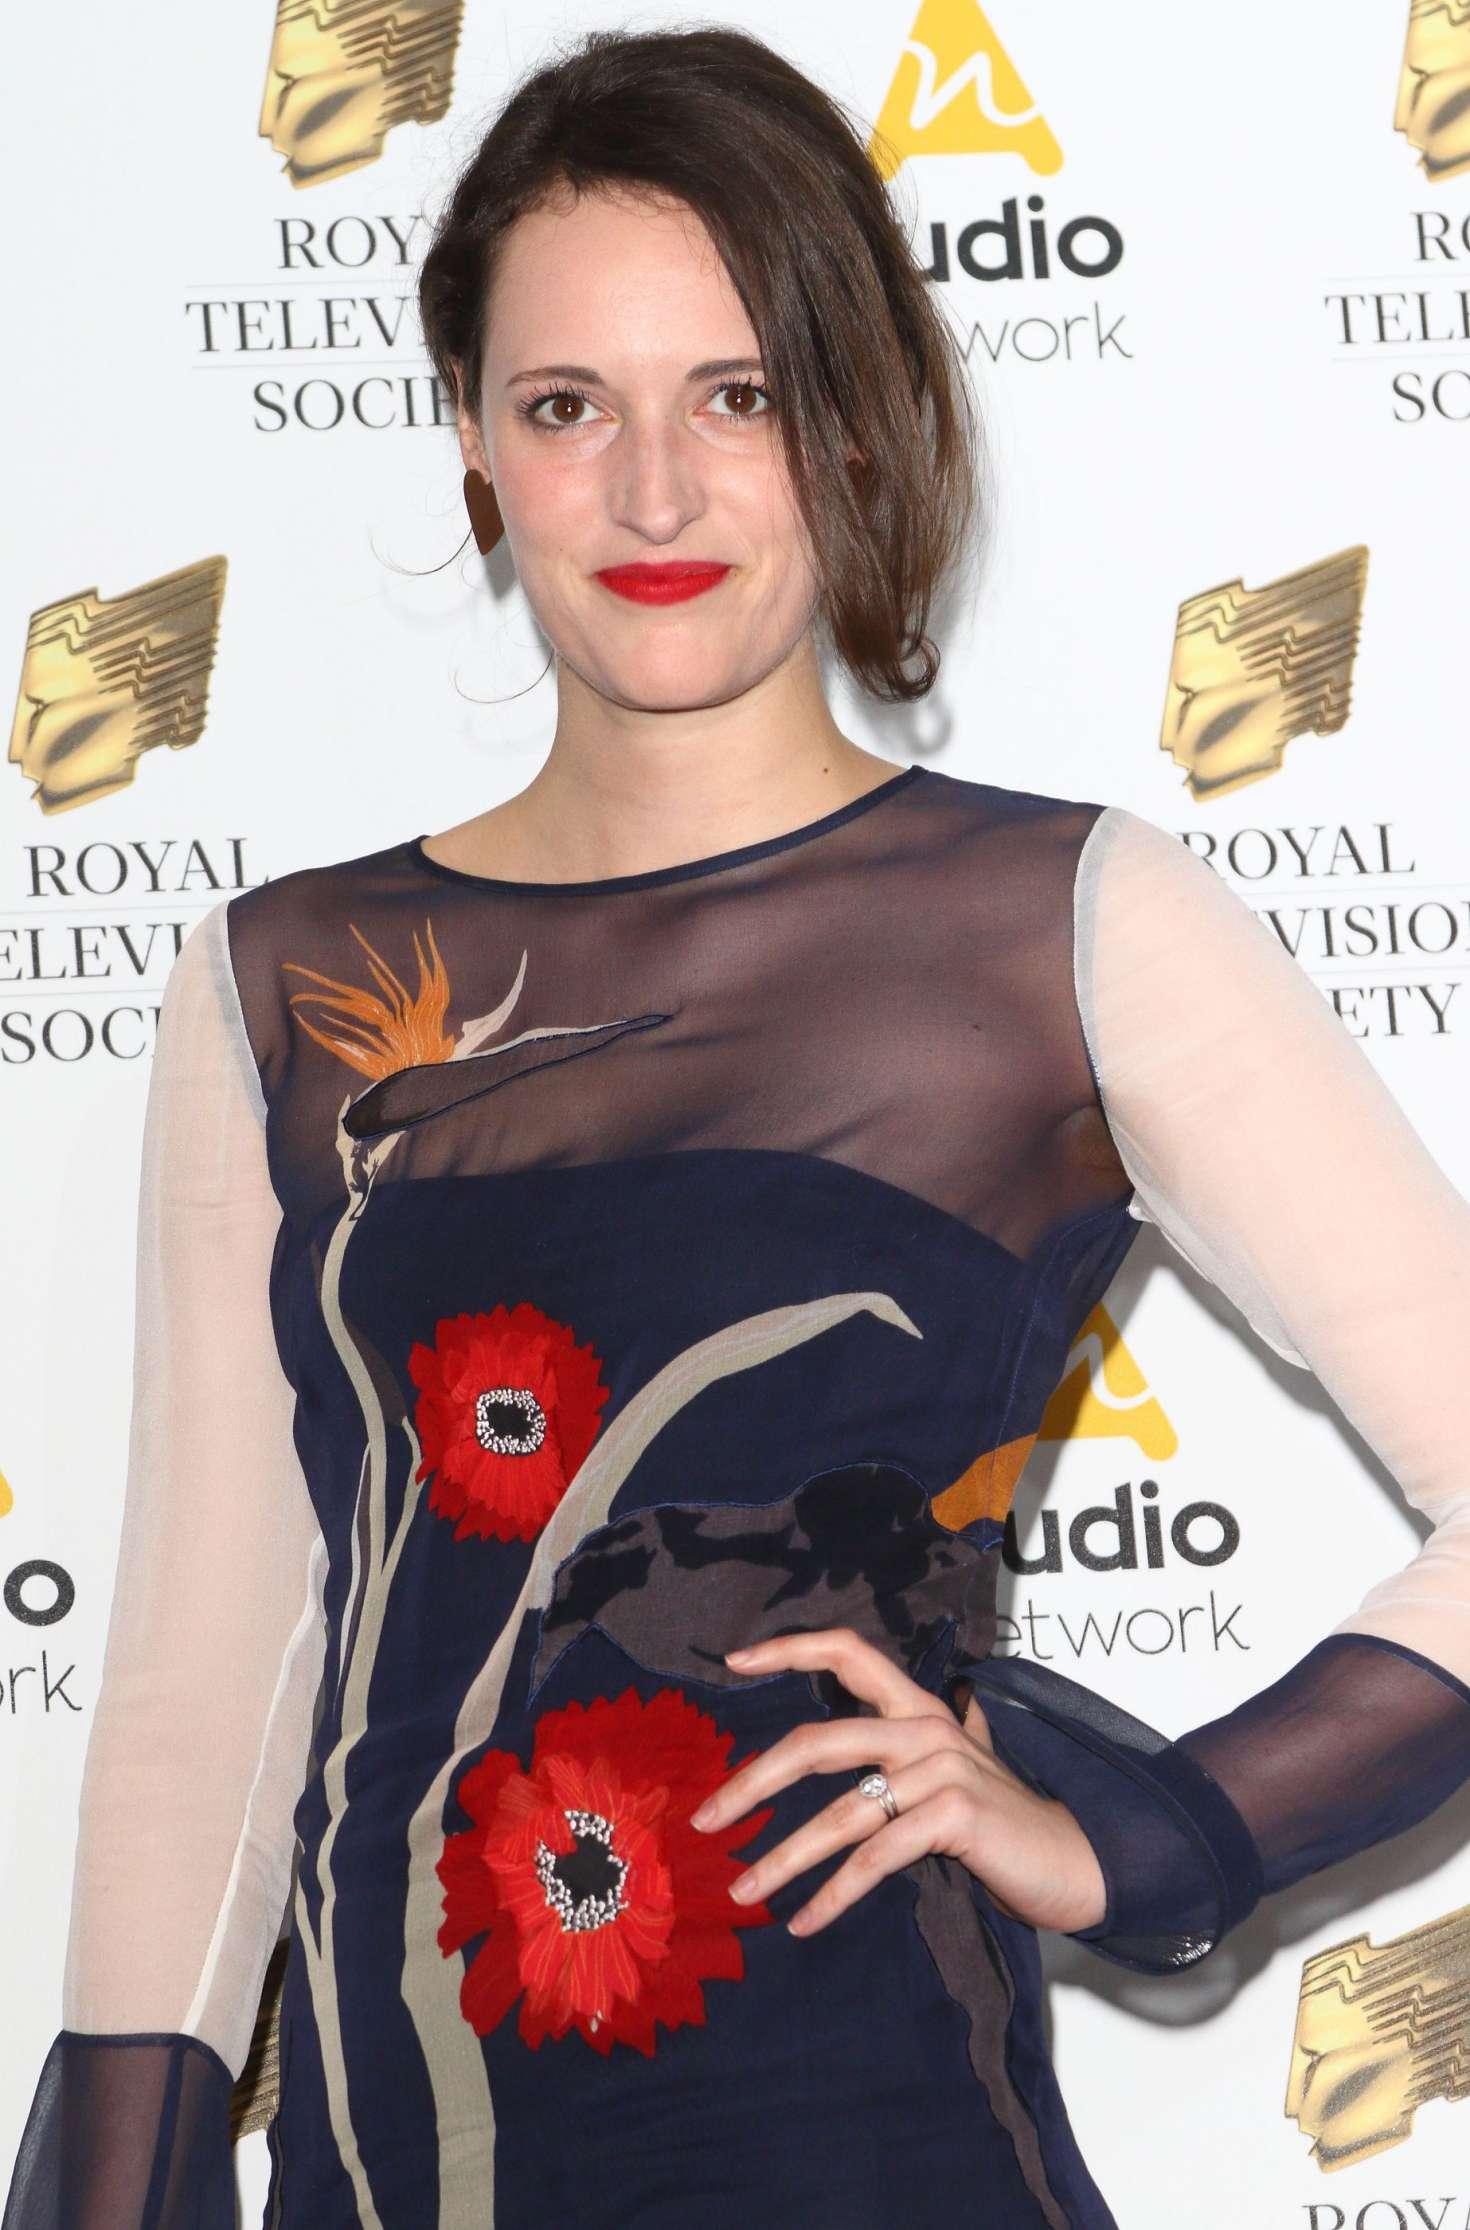 Phoebe WallerBridge  RTS Programme Awards 2017 in London